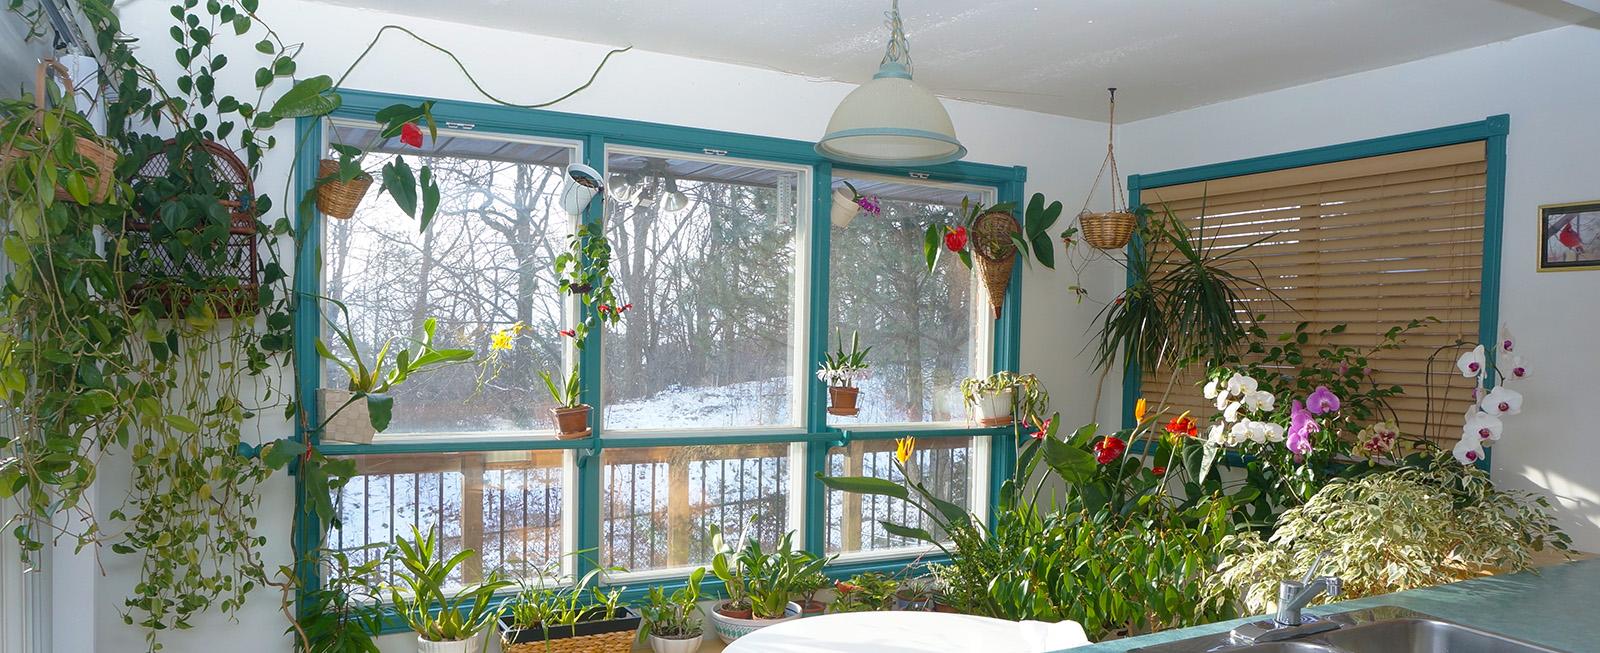 winter garden10